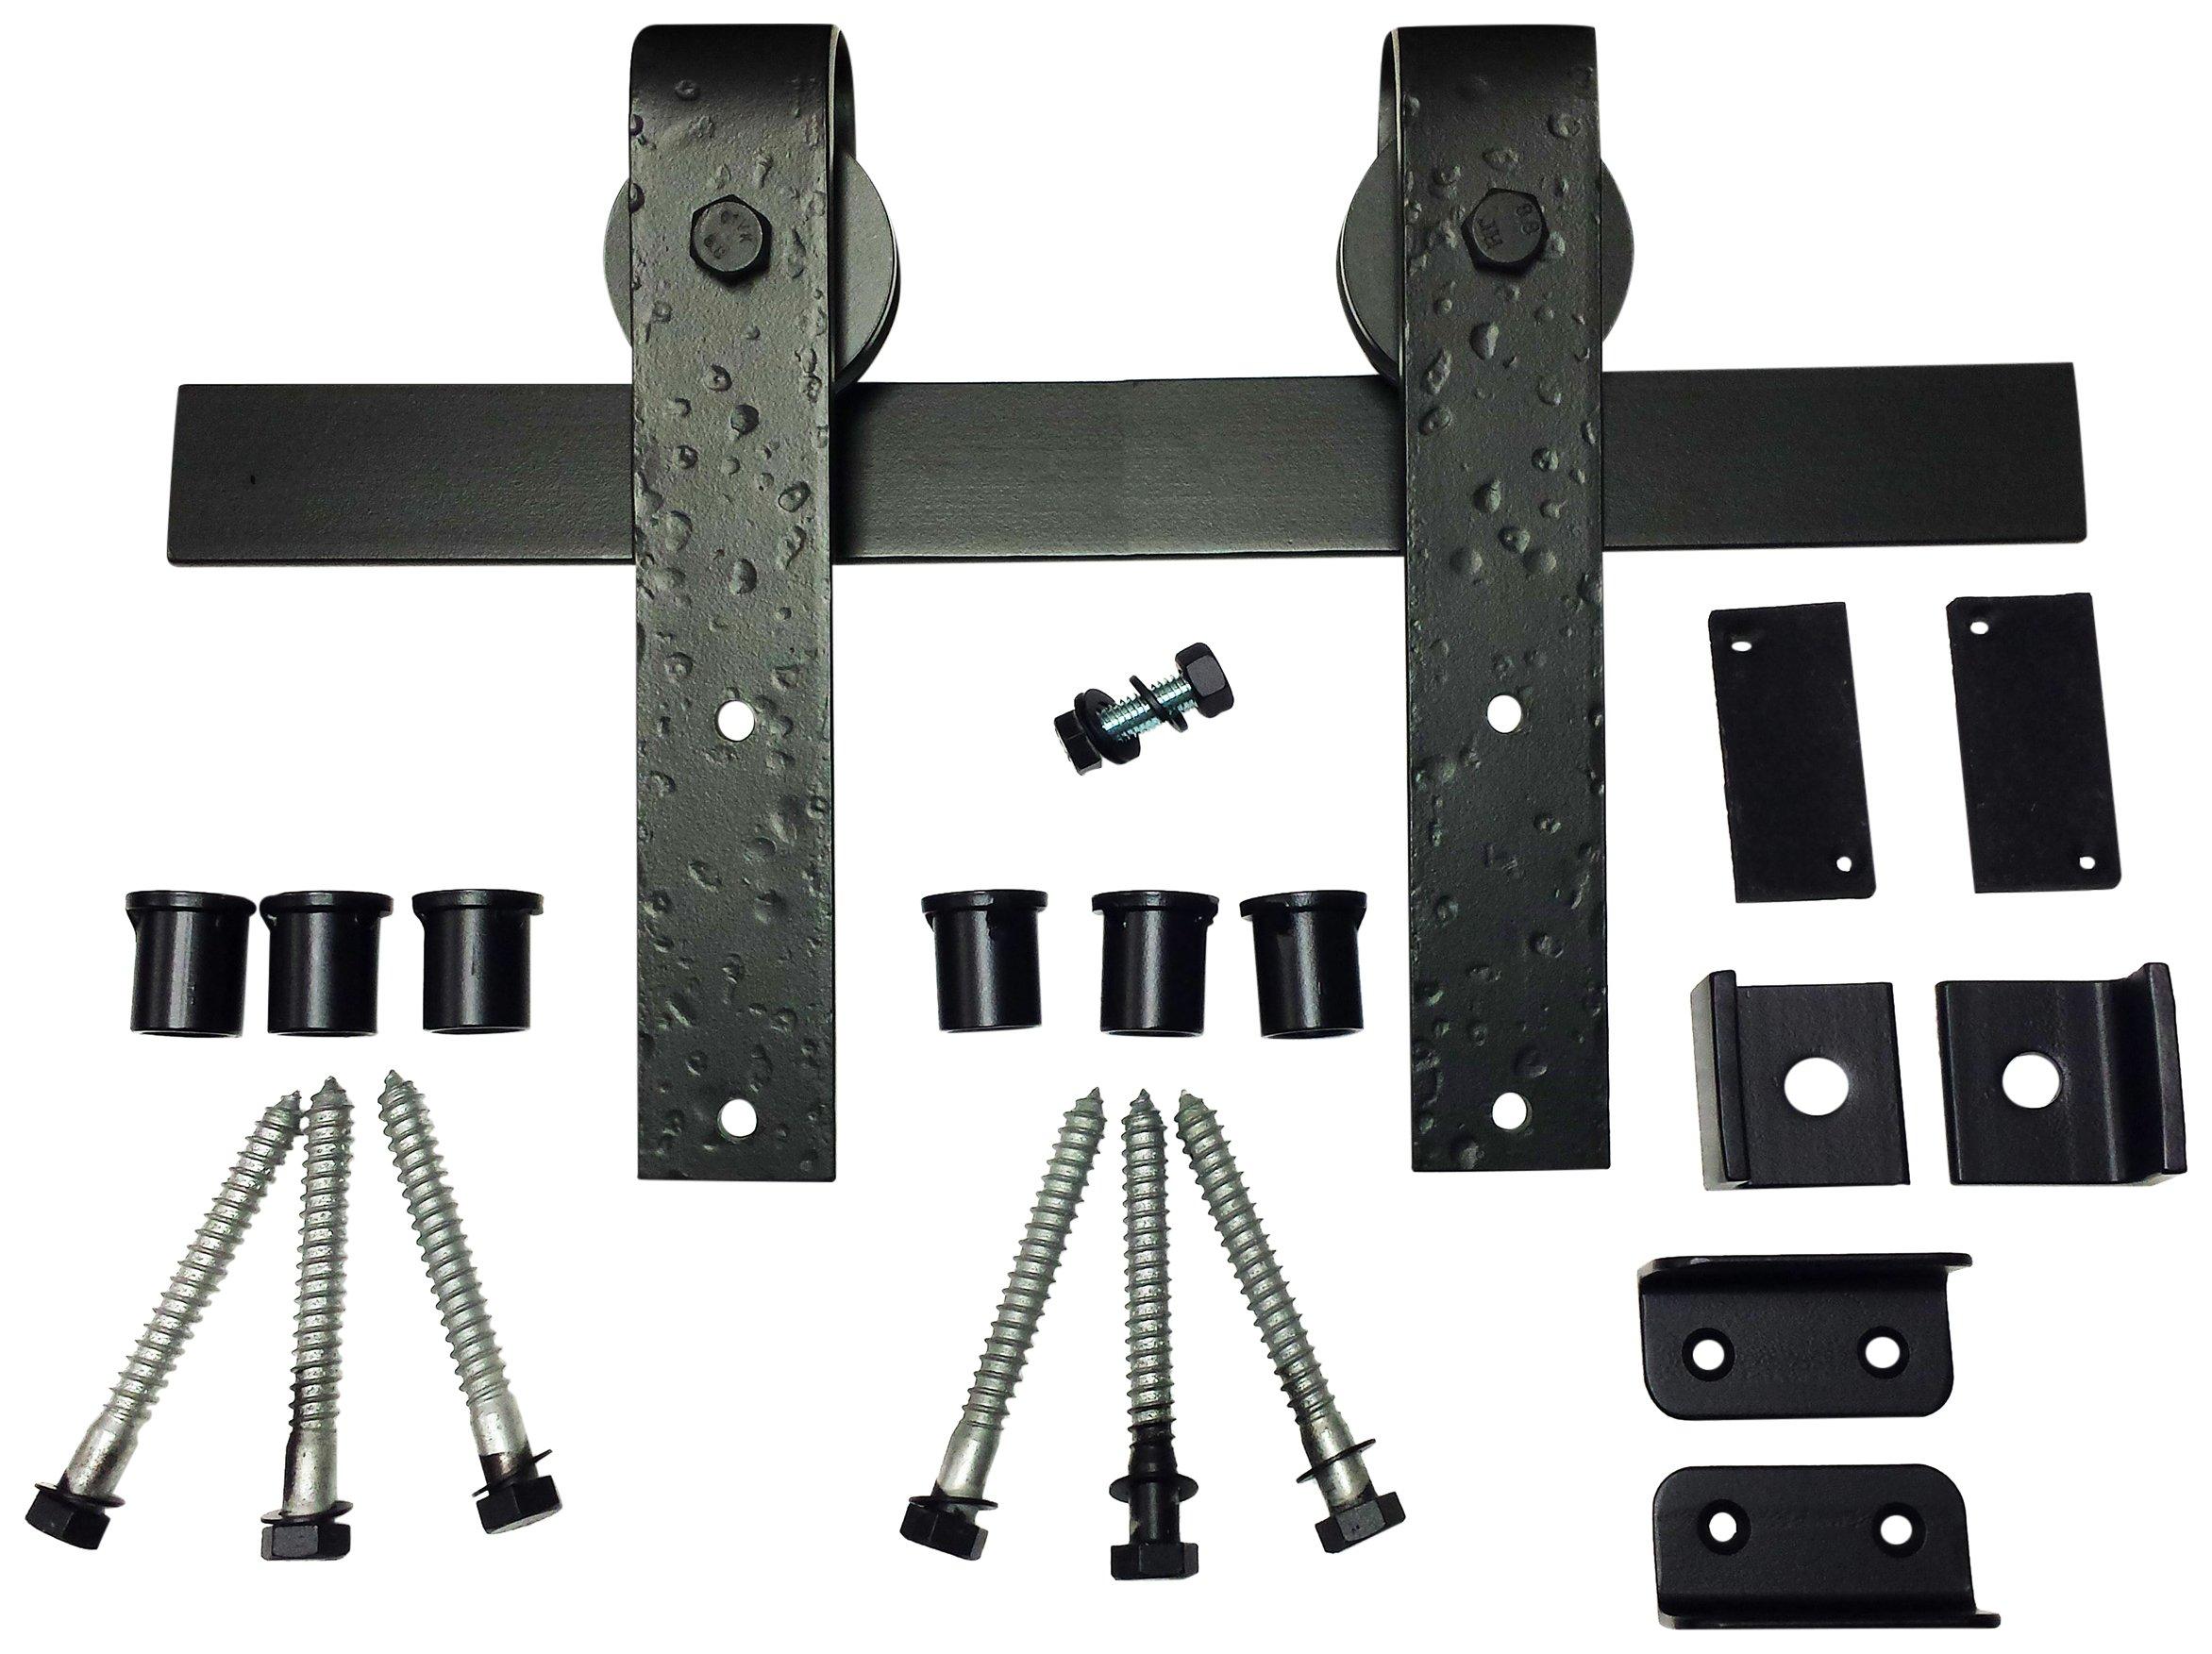 Agave Ironworks RH003-5-01 Barn Door Hardware System with 5' Track, Flat Black Finish